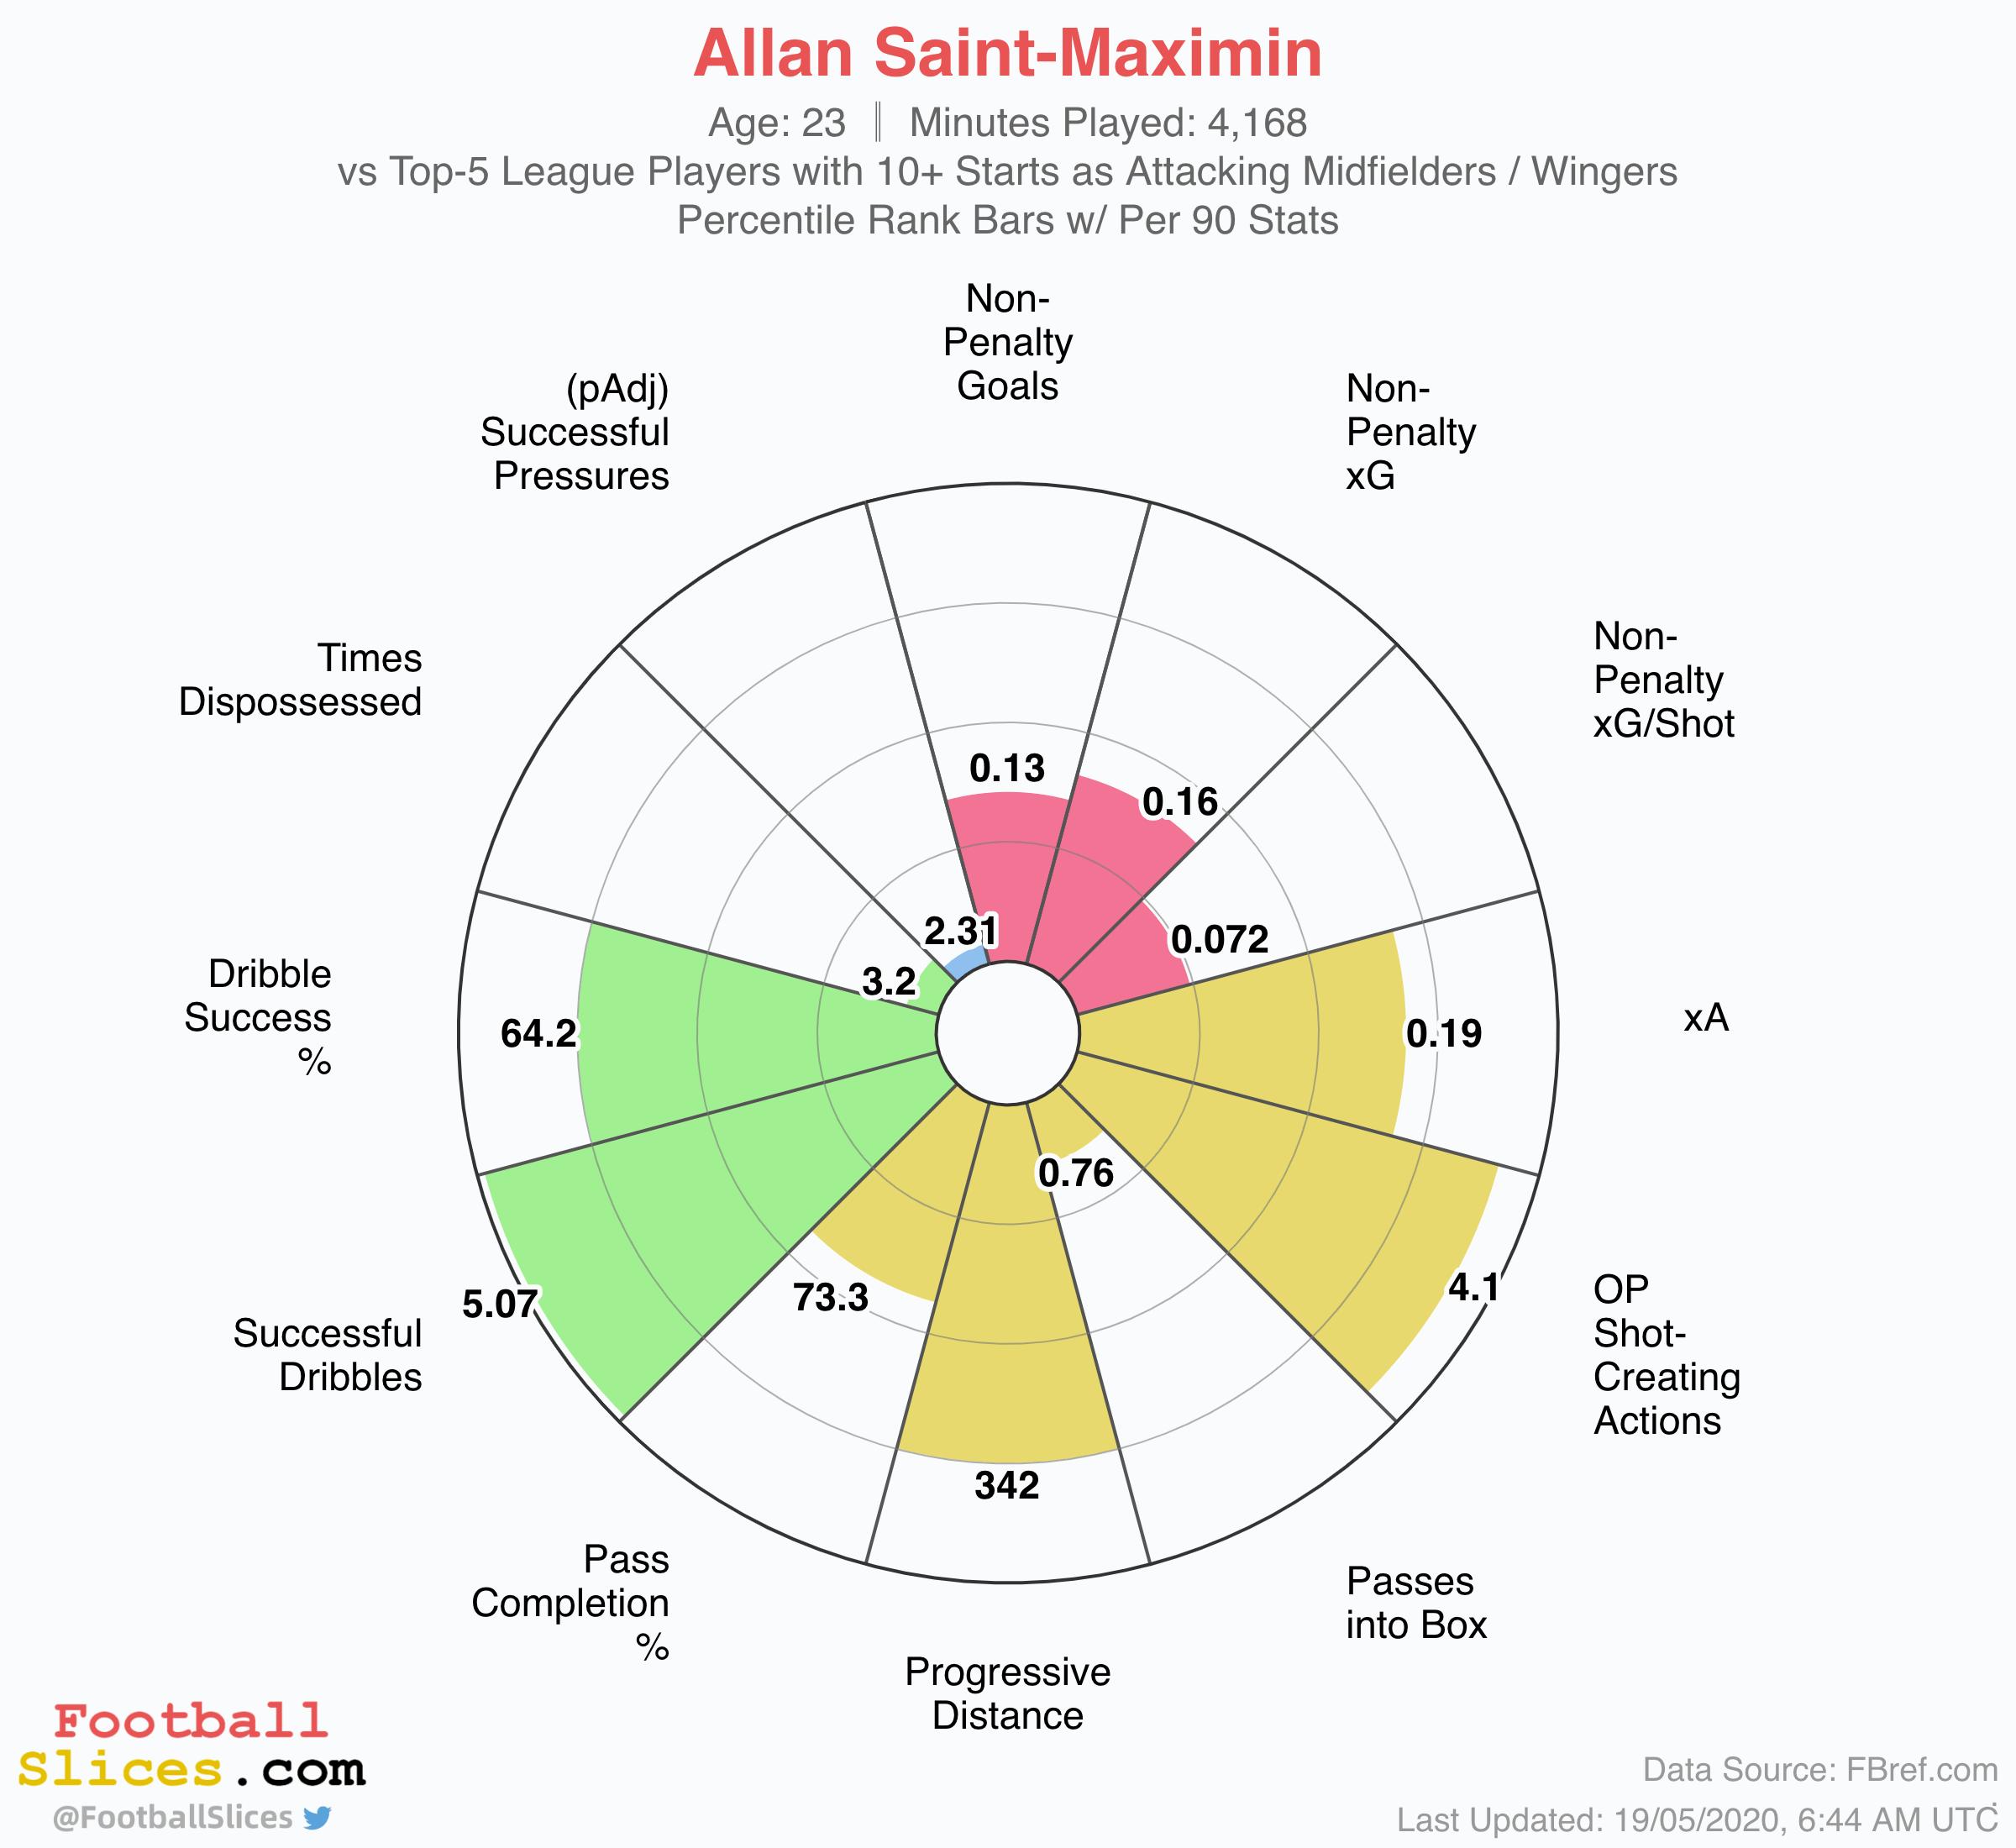 Allan Saint-Maximin: The French maverick who could light up St. James' Park